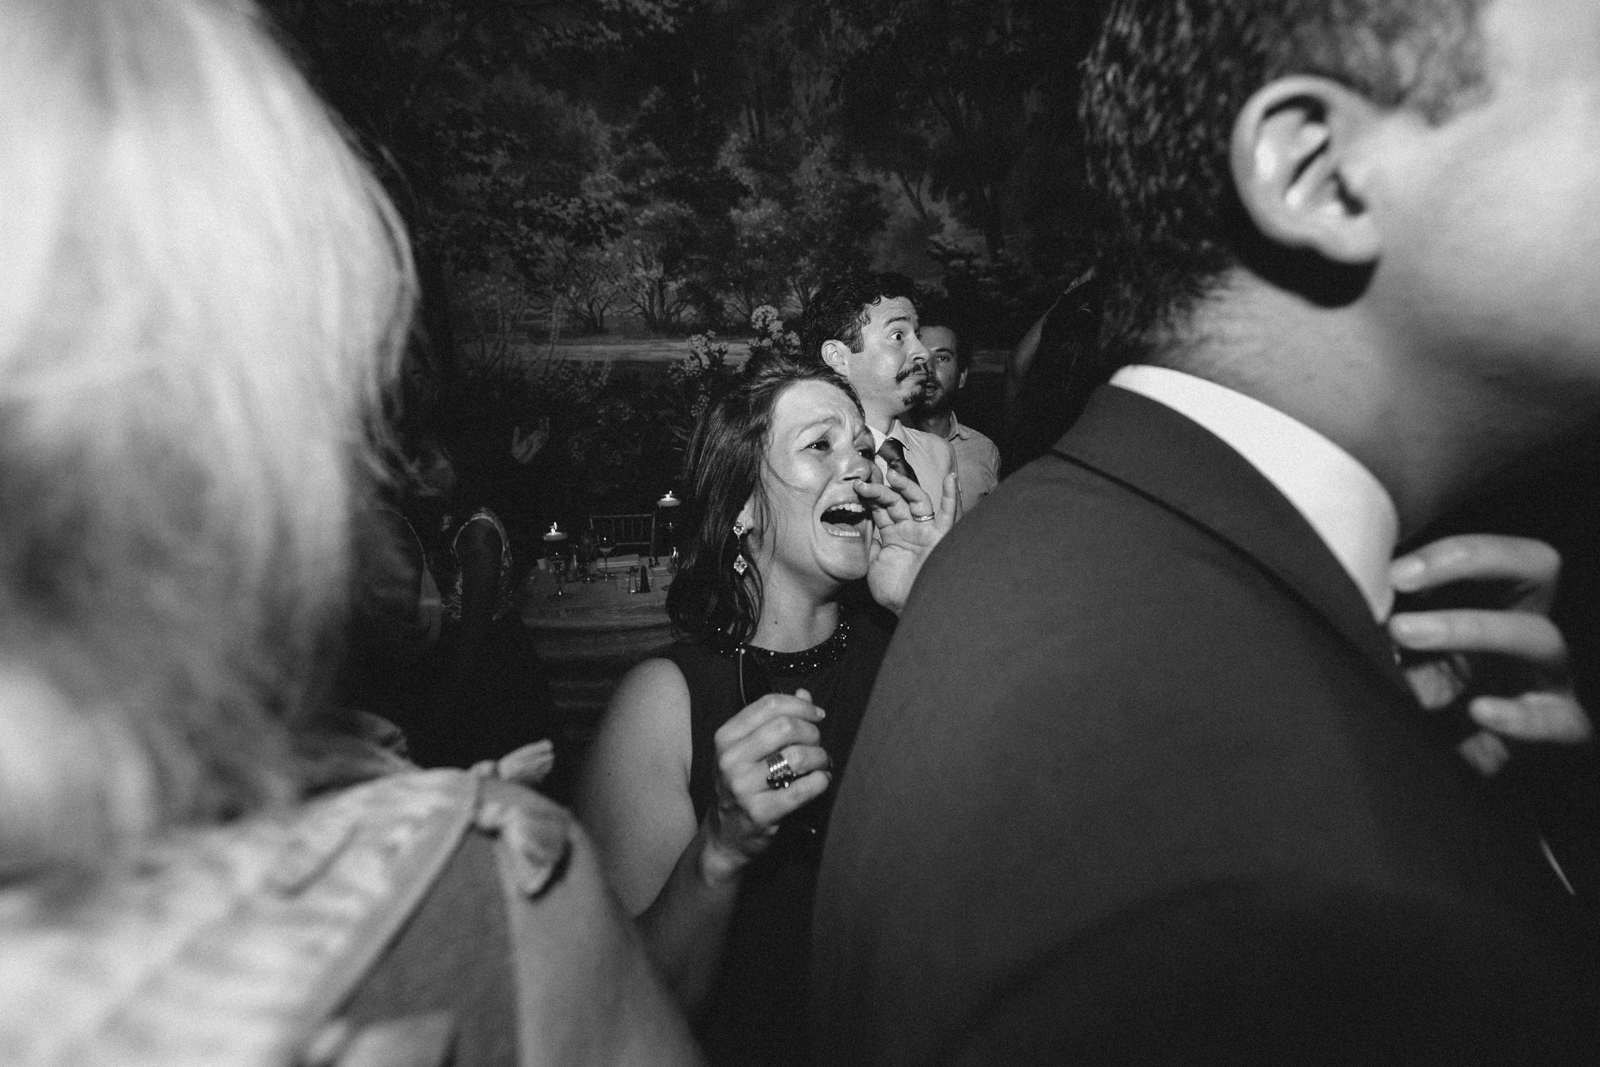 NYC Wedding Photography Sofitel Central Park Brooklyn Photographer Boris Zaretsky _B2C3107.jpg